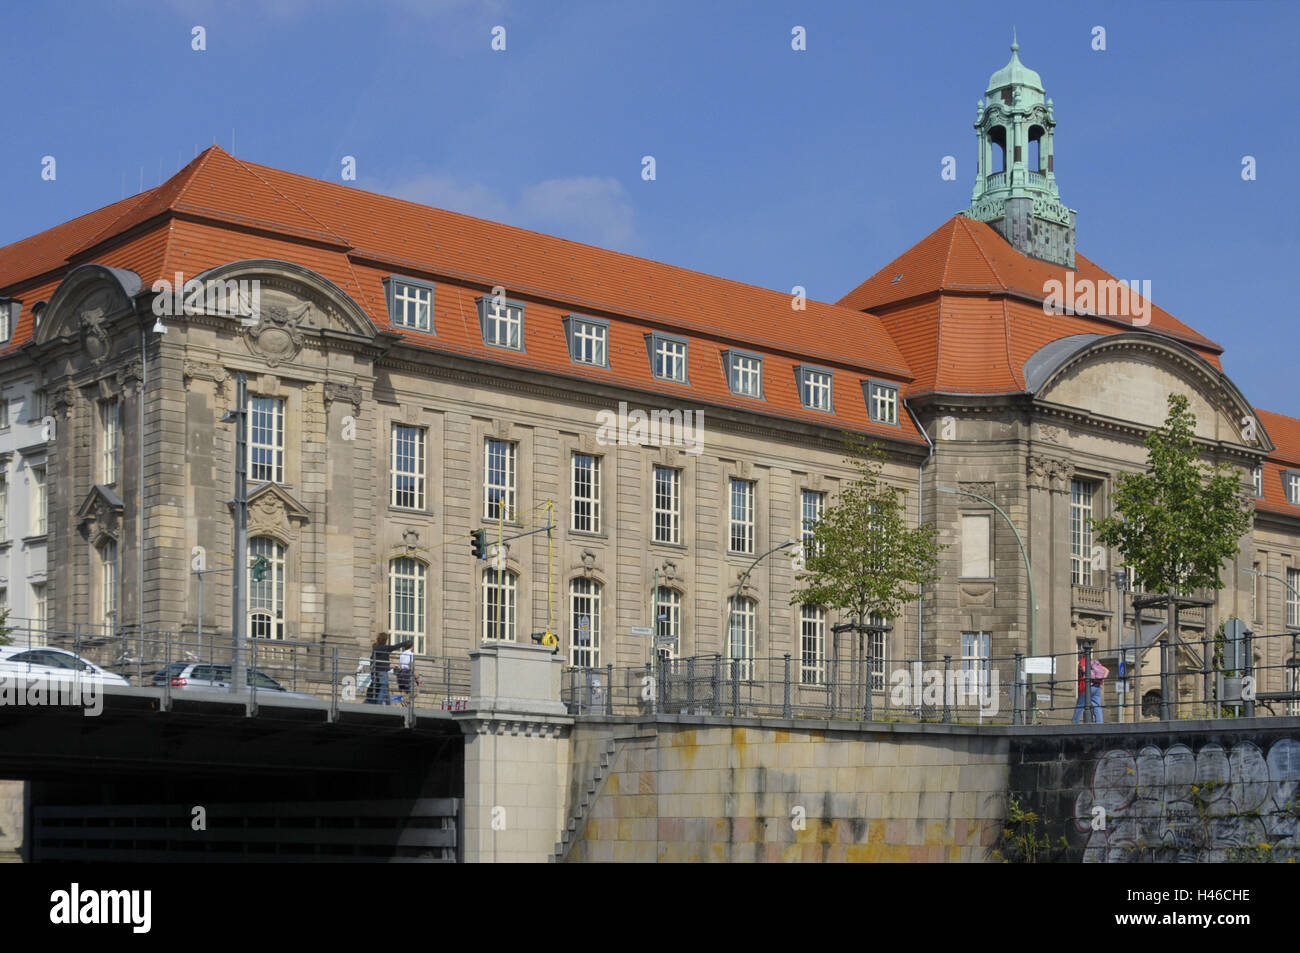 Sand's jug bridge, Invalidenstrasse, Friedrich's Wilhelm town, ministry, Berlin-splinter duration navigation - Stock Image